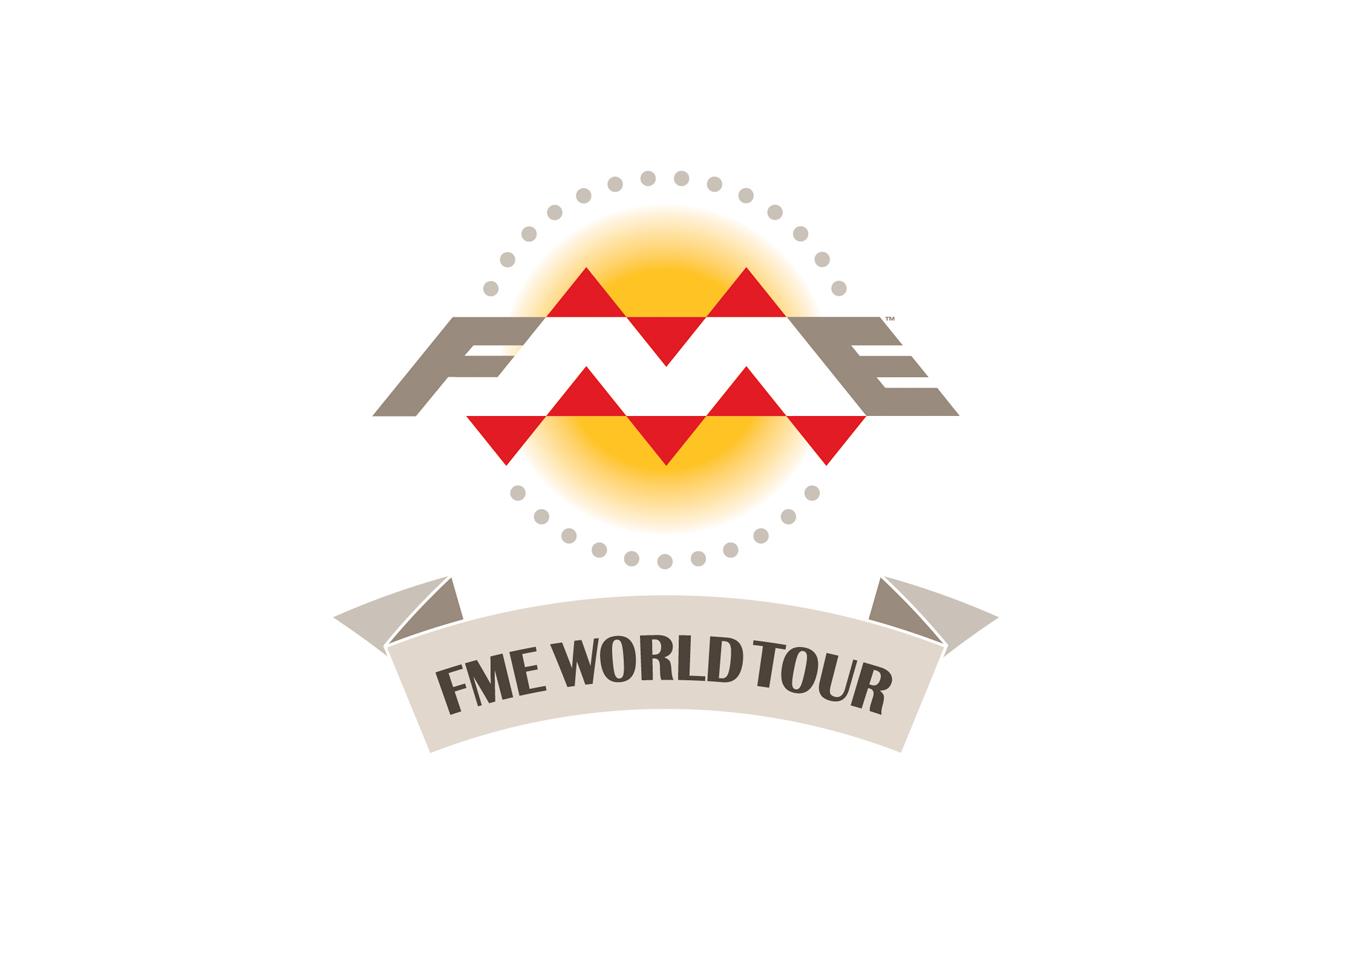 FME-WORLD-TOUR